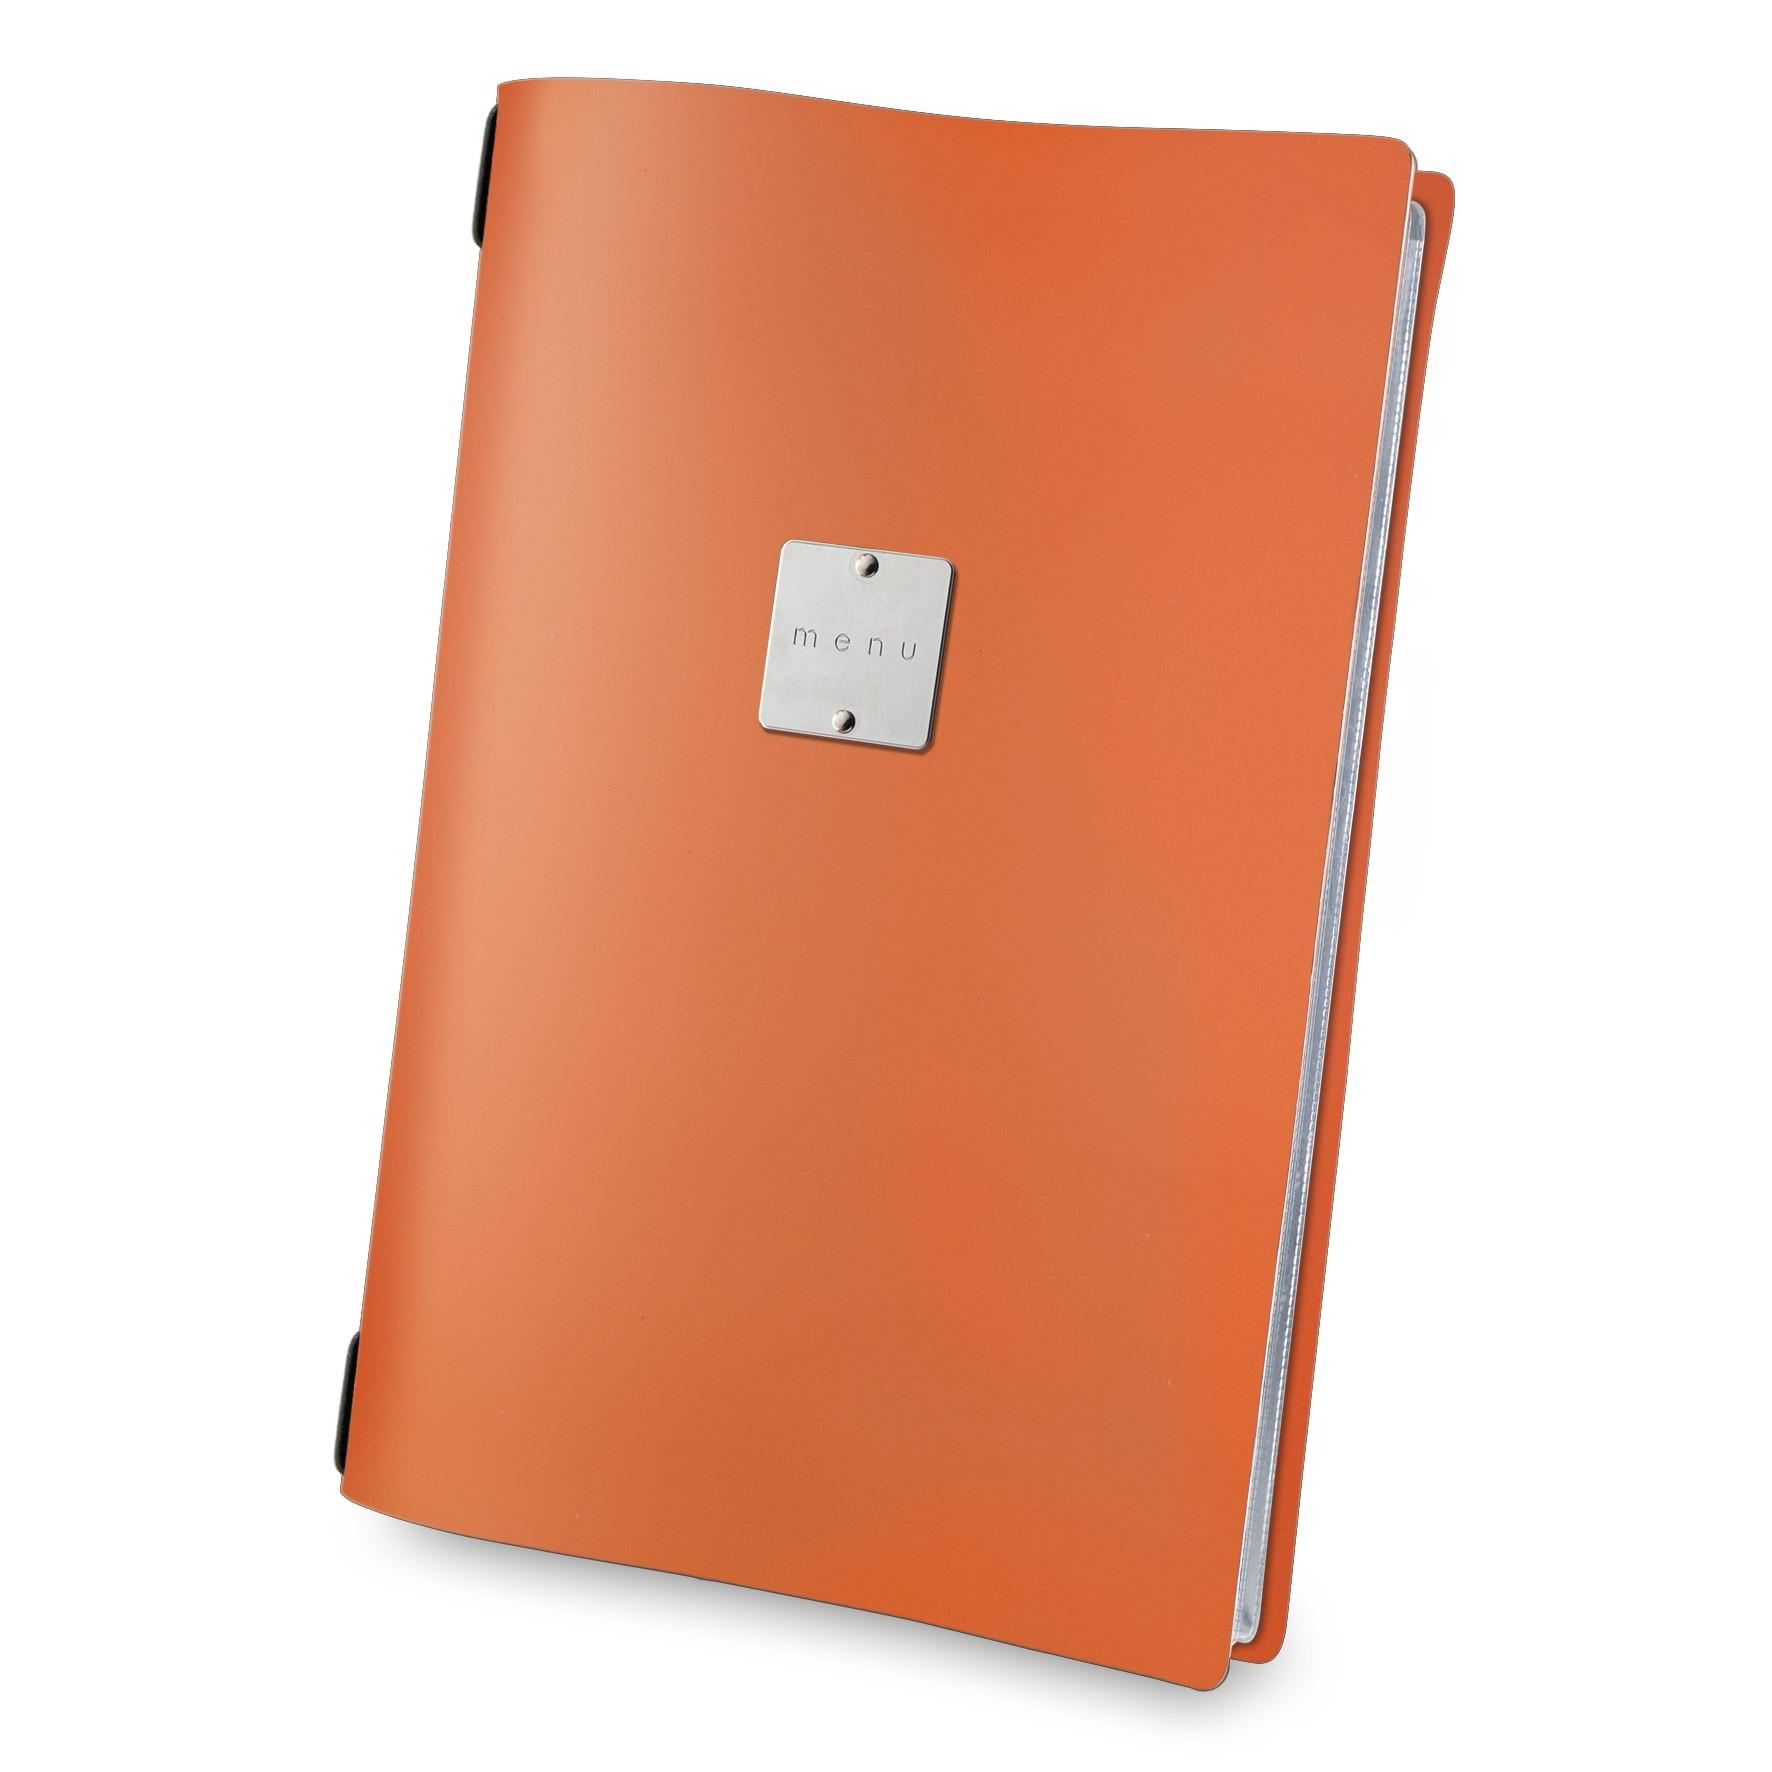 Fashion menu cover orange